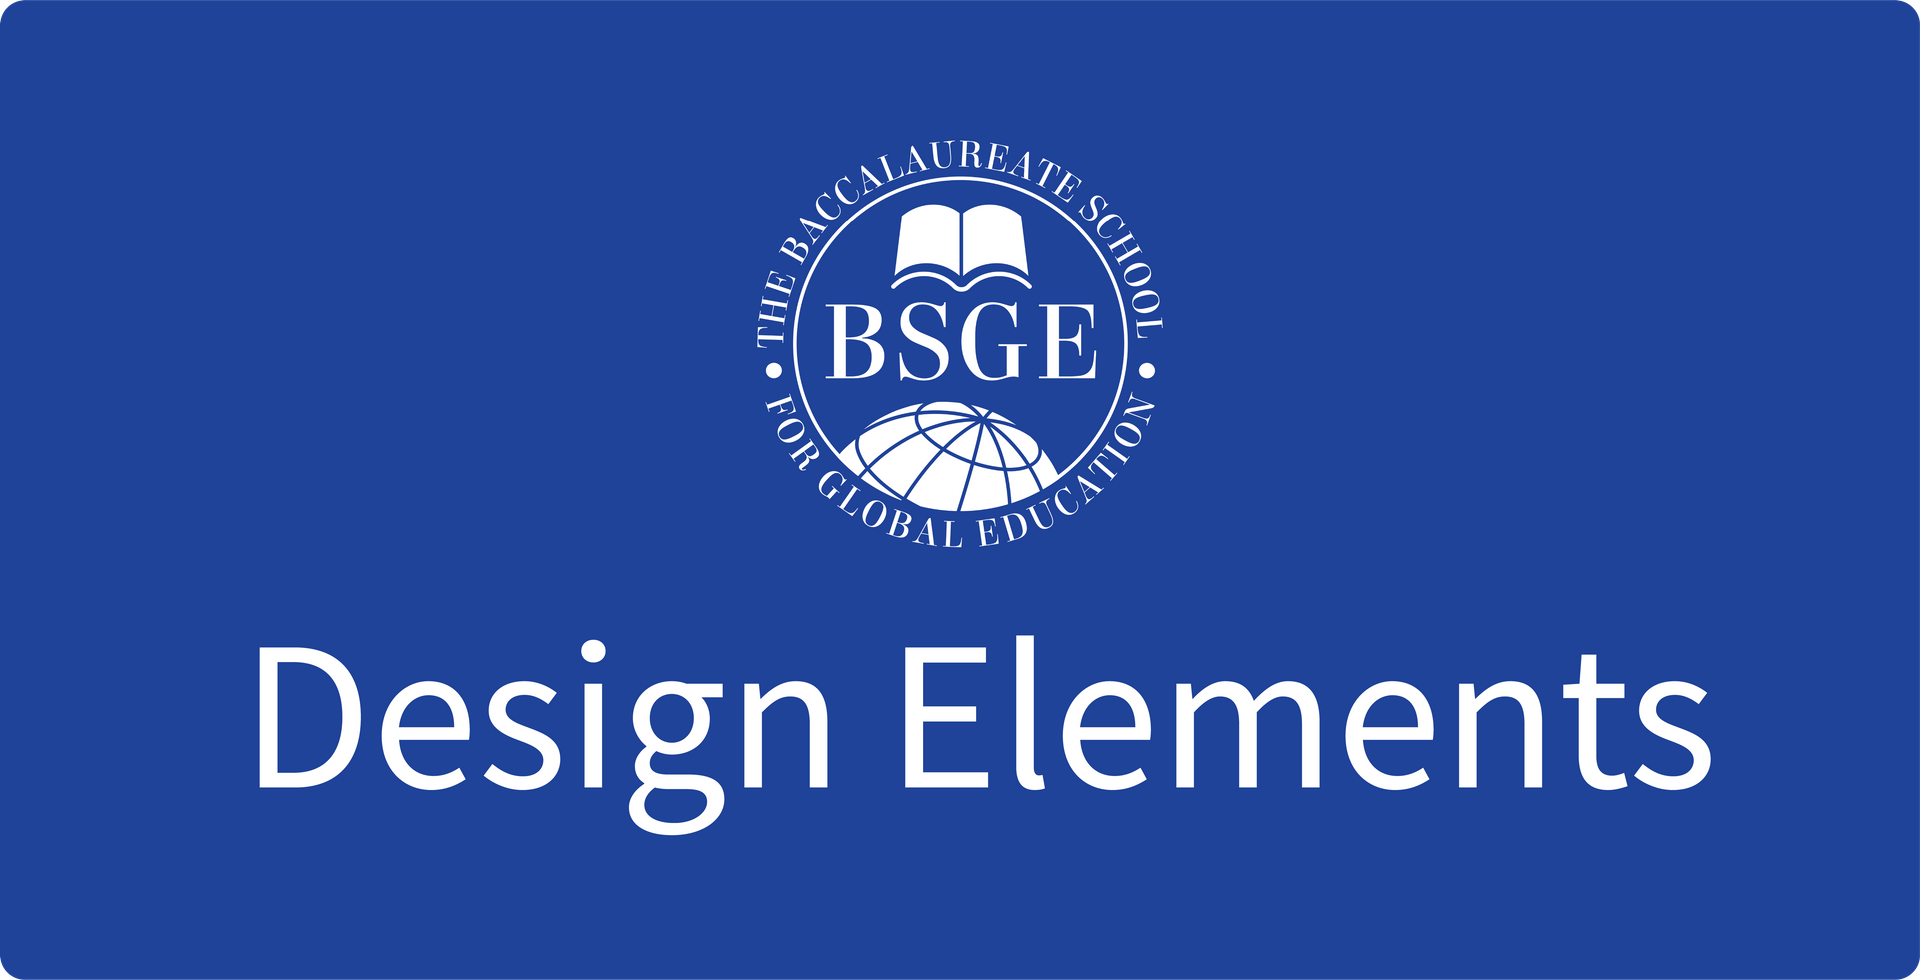 BSGE Design Elements